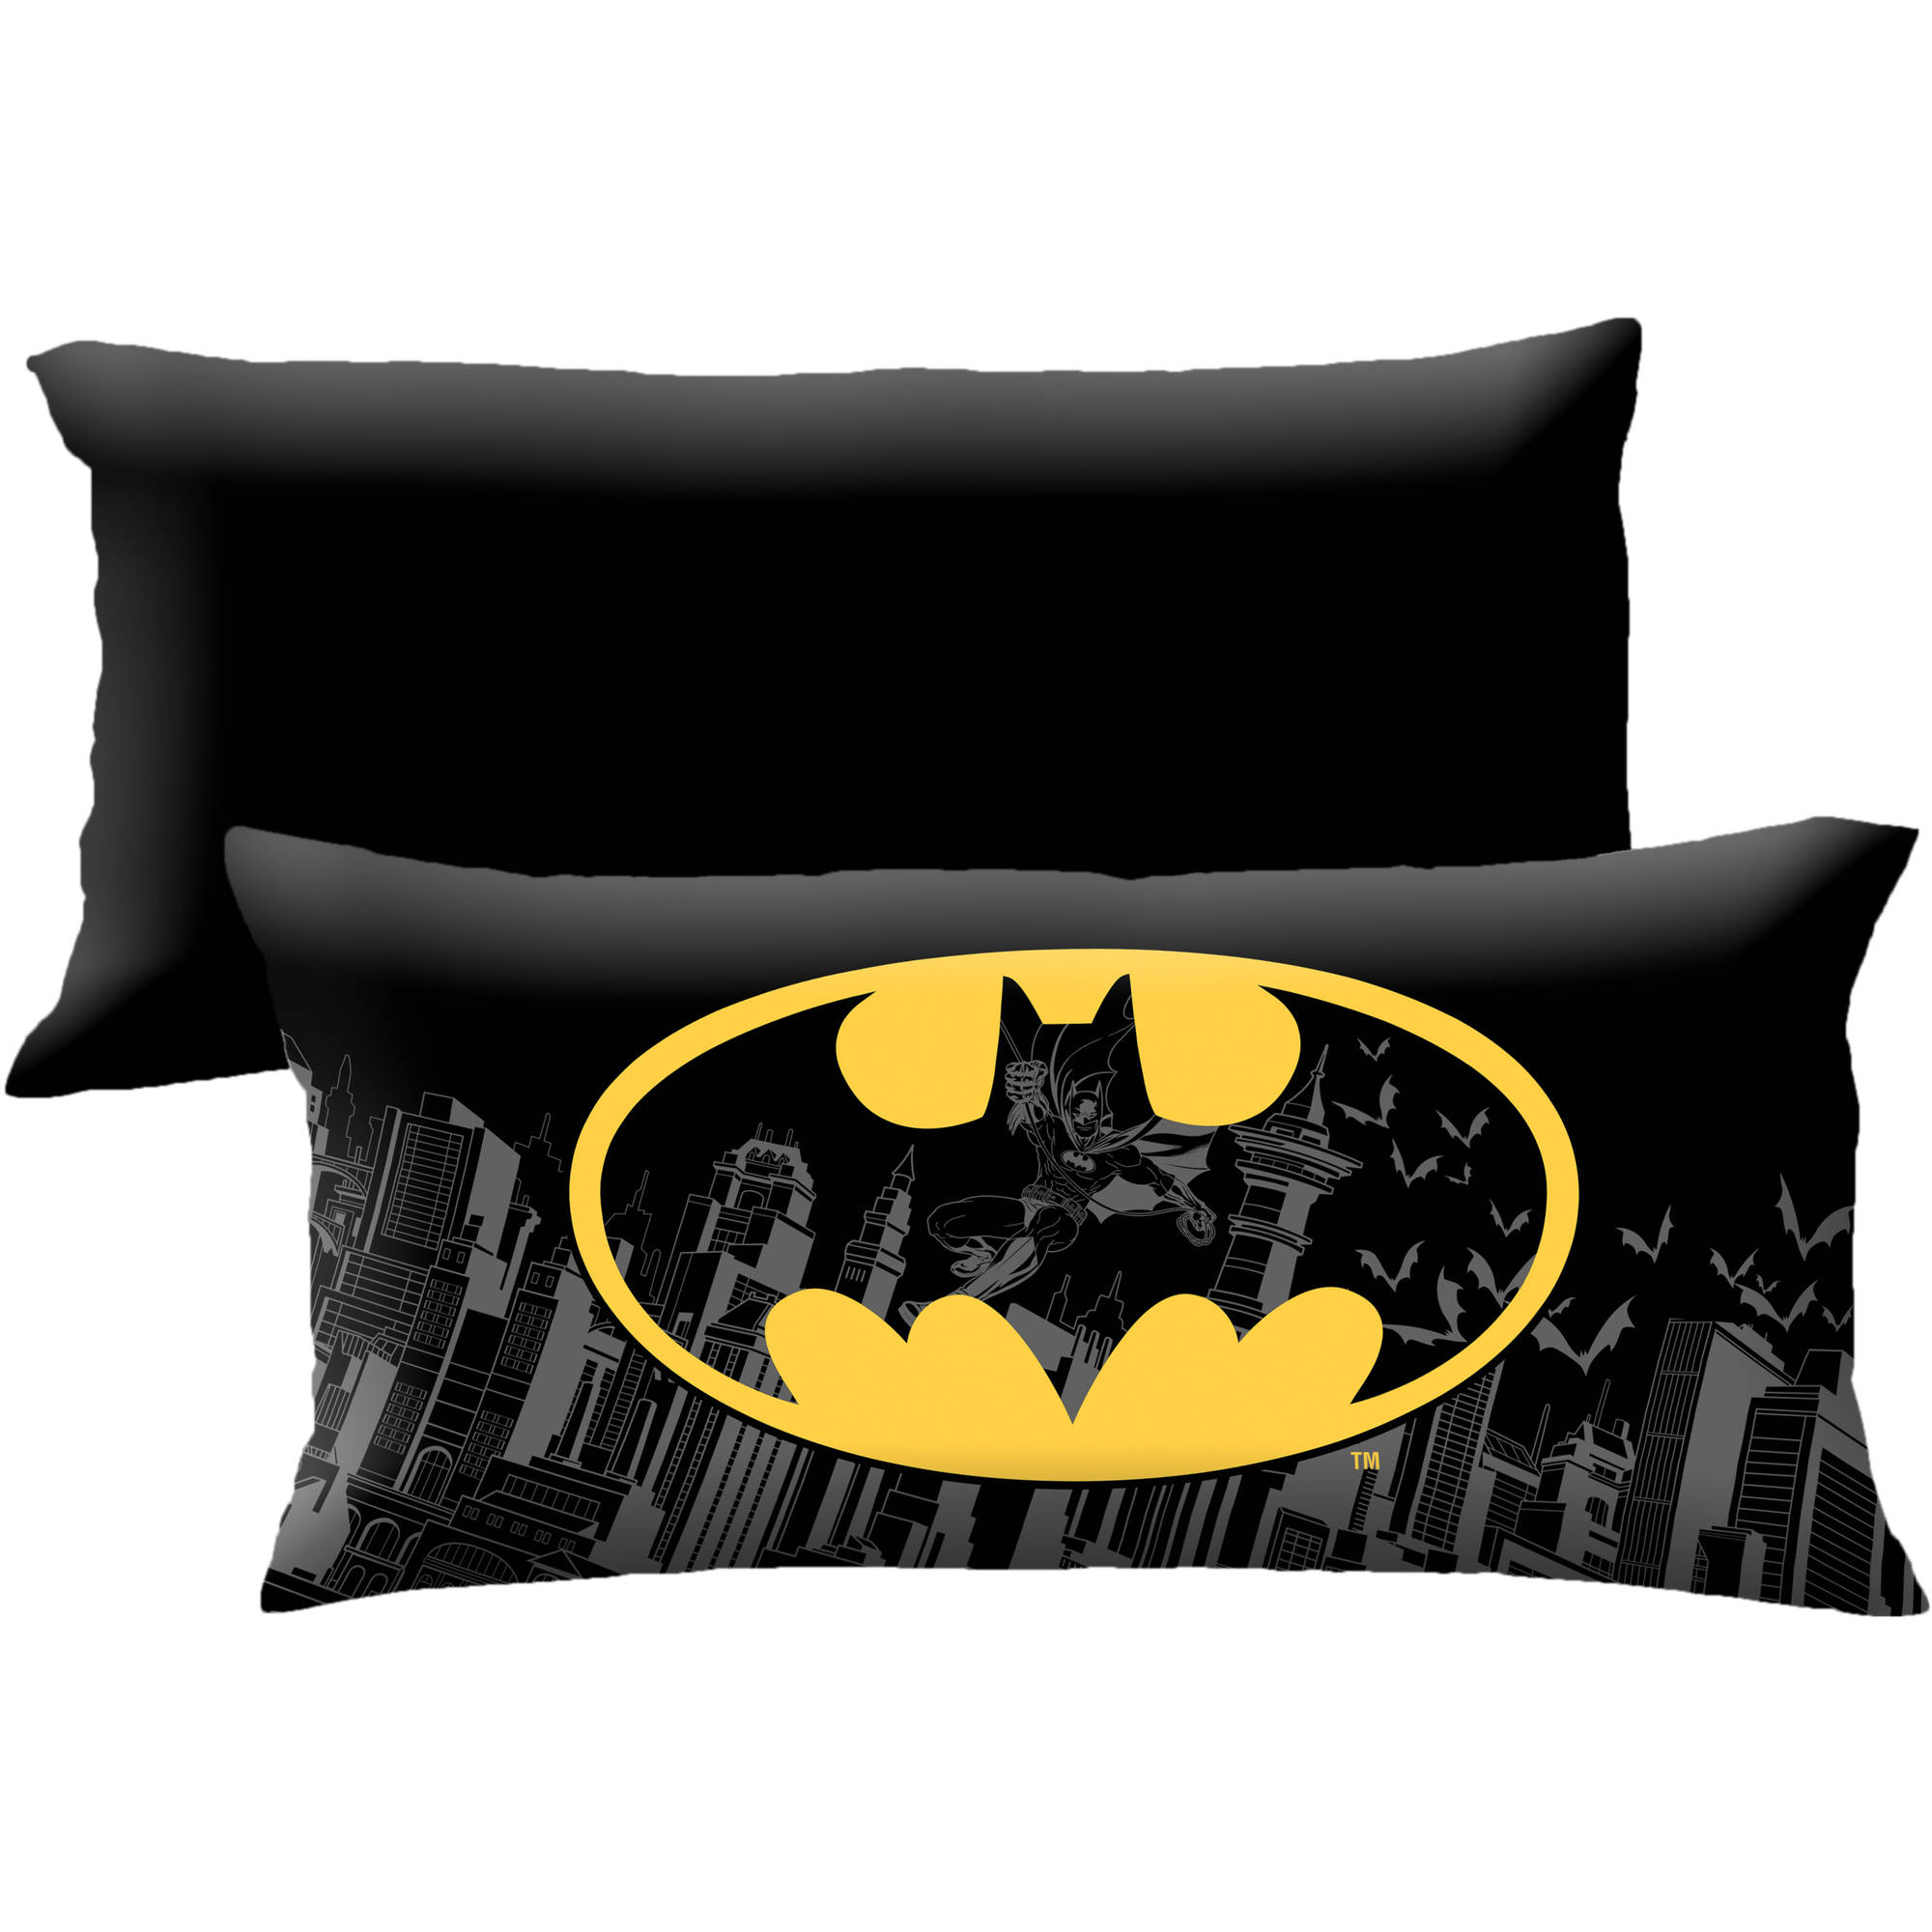 "Batman 'The Bats Are Out' 18"" x 36"" Body Pillow"